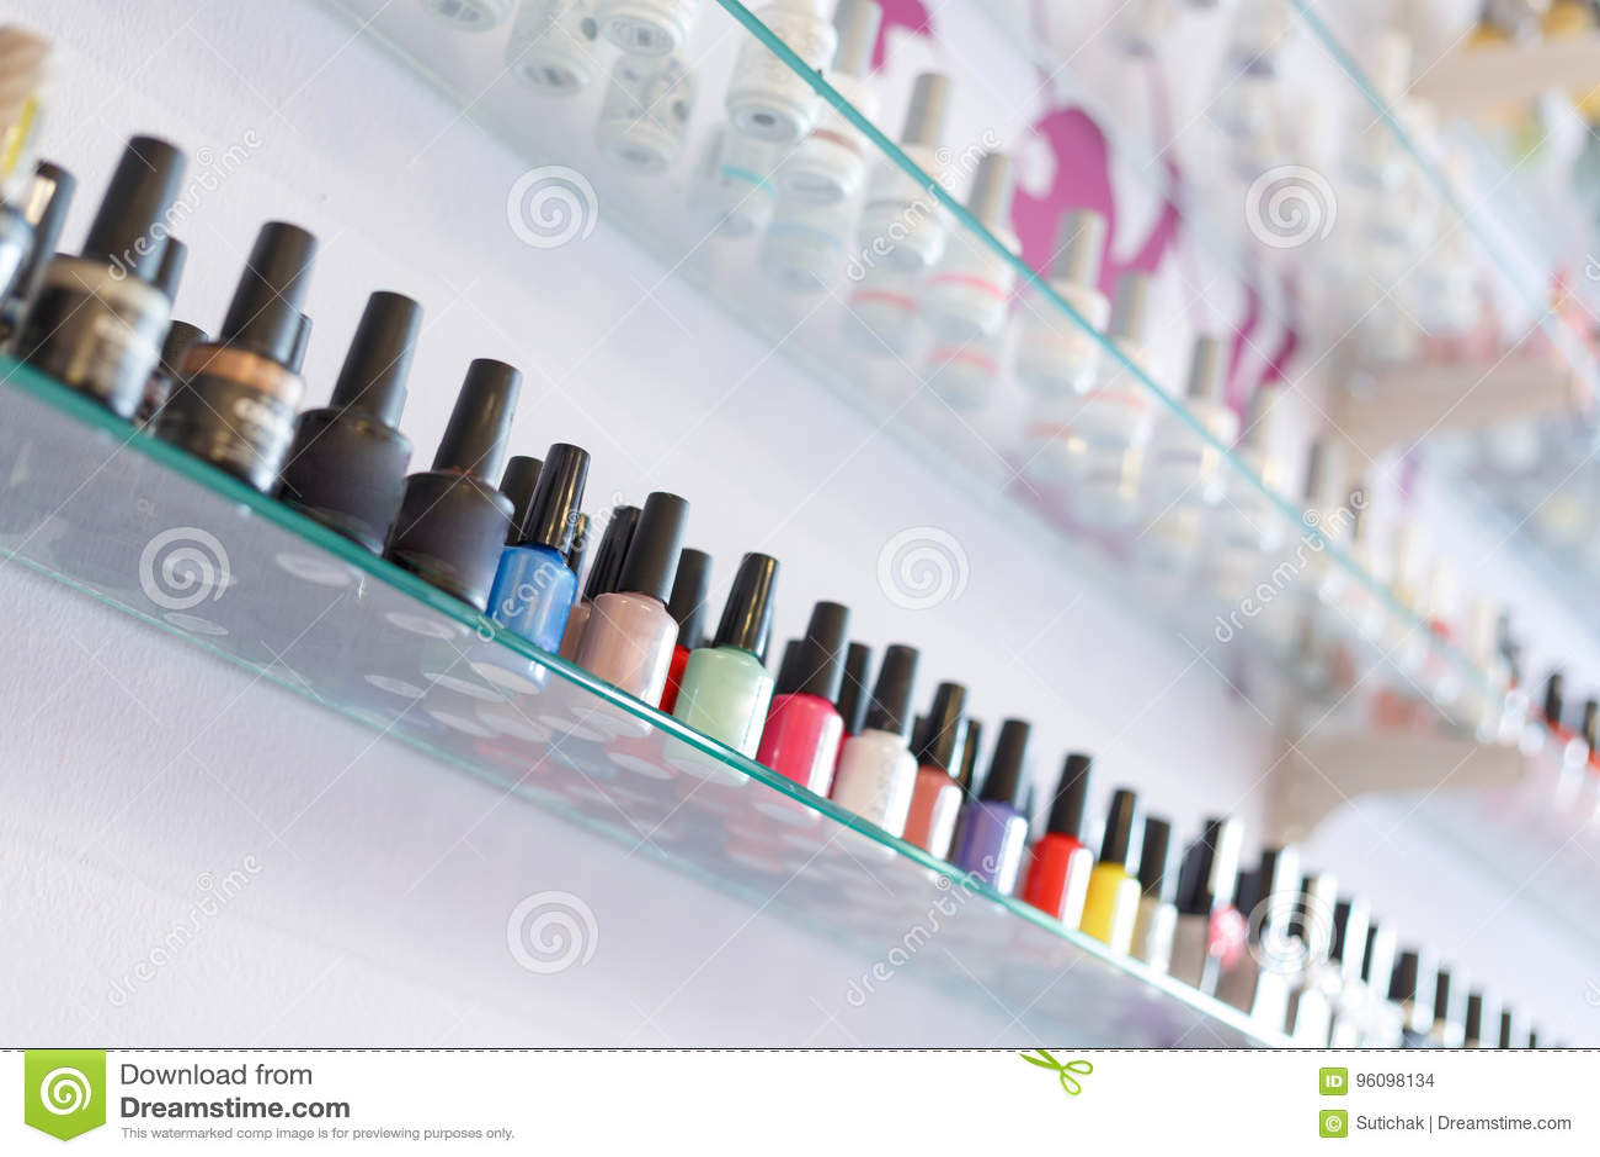 Colorful Manicure Nail Polish Bottle Collection Set On Shelf Stock ...